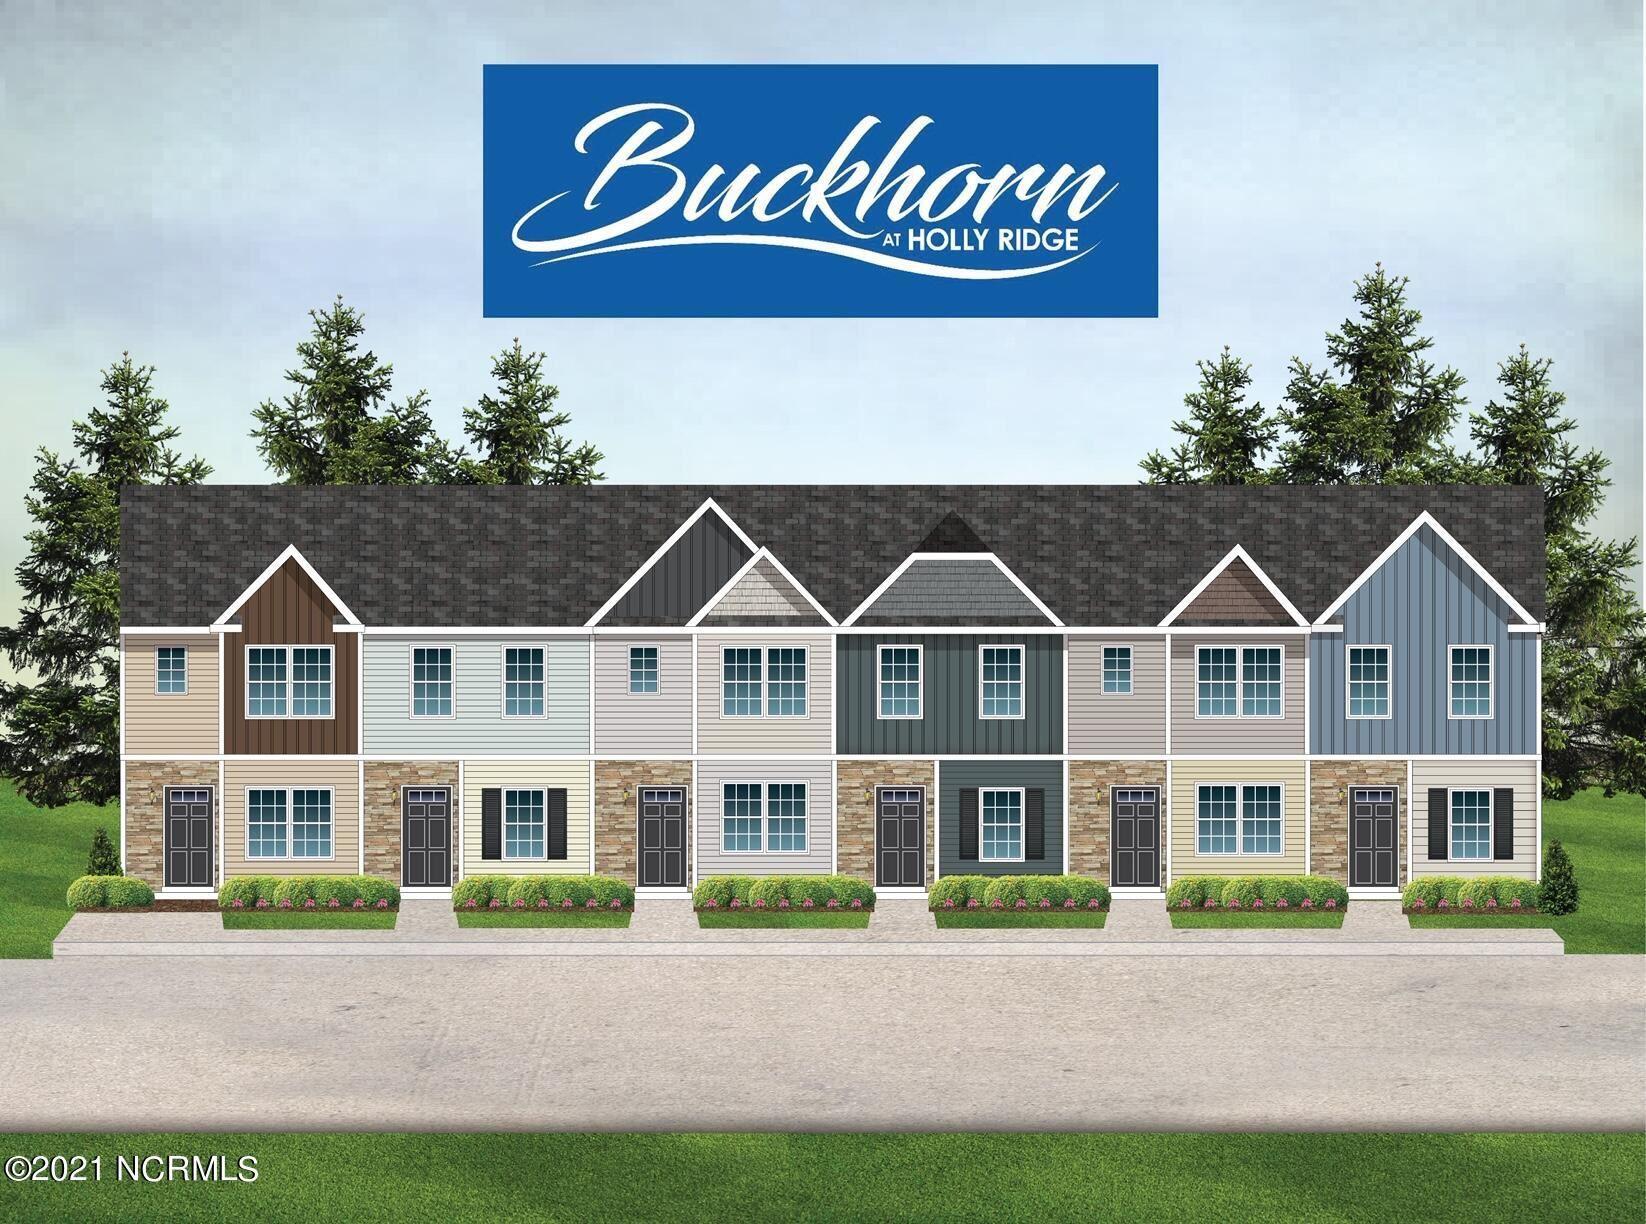 Photo of 186 Buckhorn Ave., Holly Ridge, NC 28445 (MLS # 100294397)